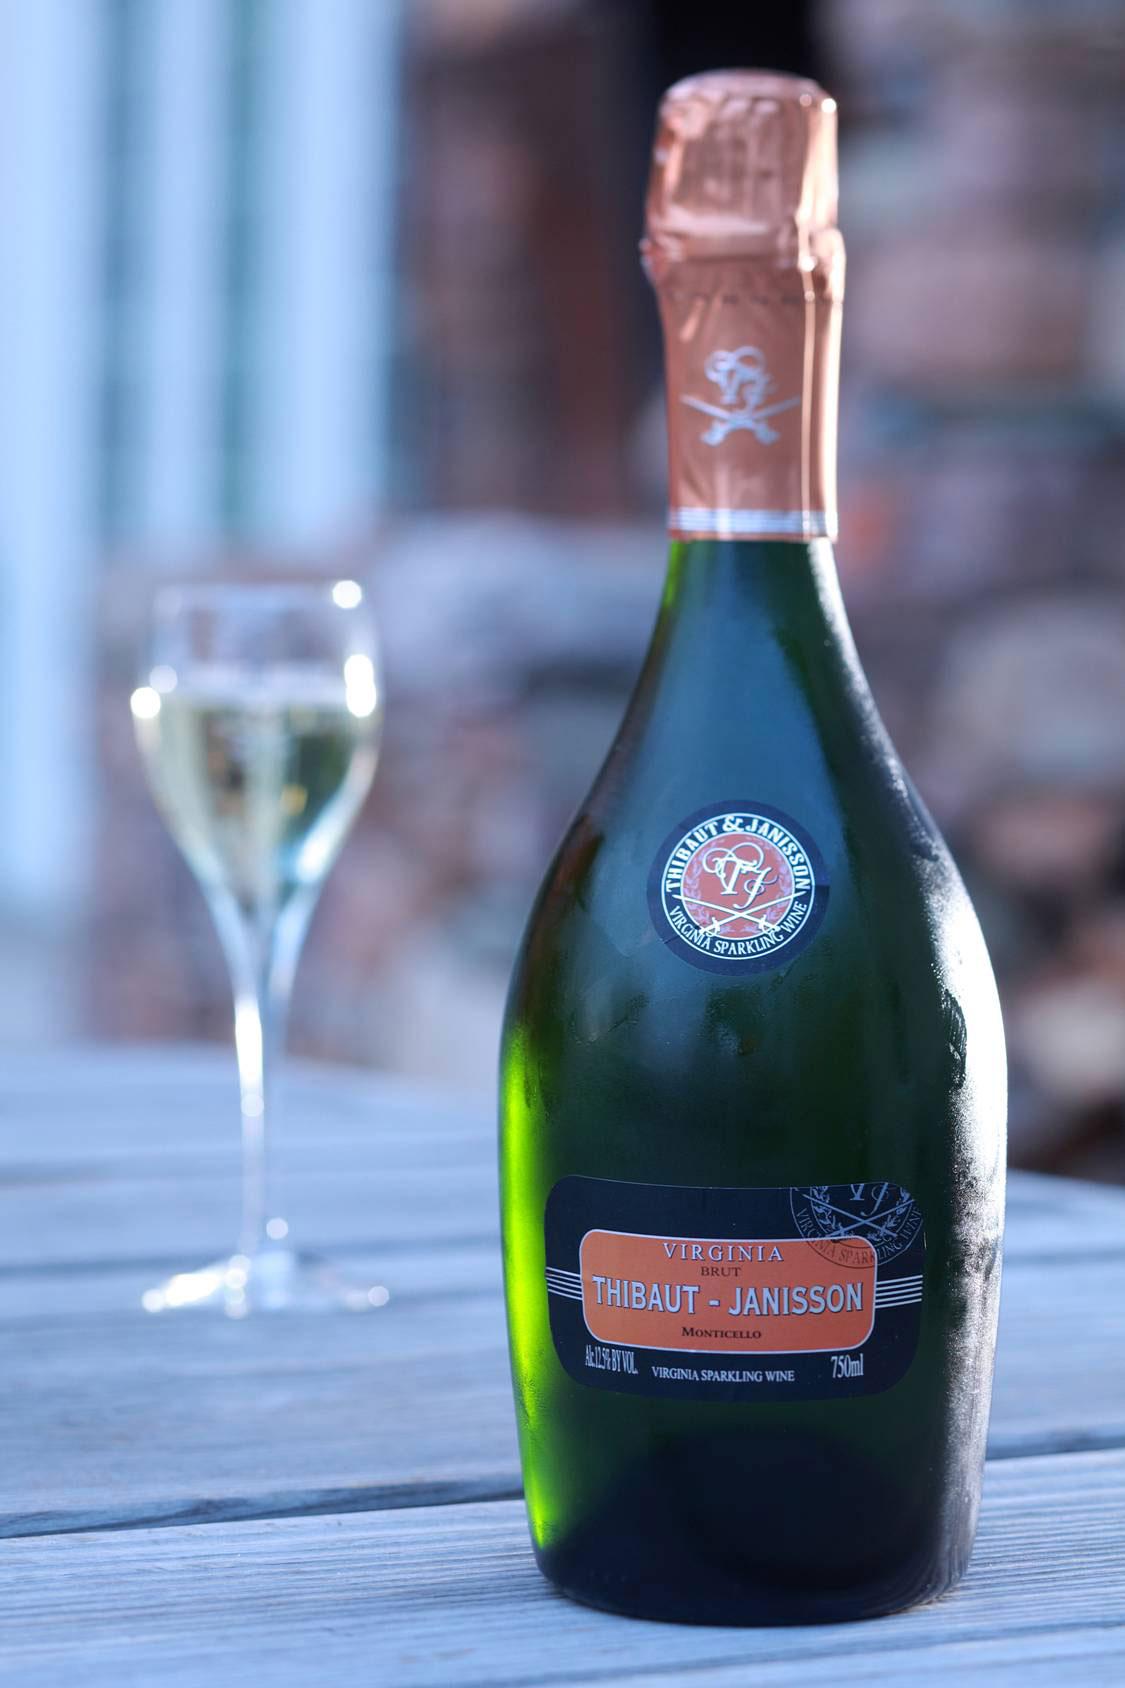 Thibaut Jannison Winery - Virginia Sparkling Wine - Blanc de Chardonnay